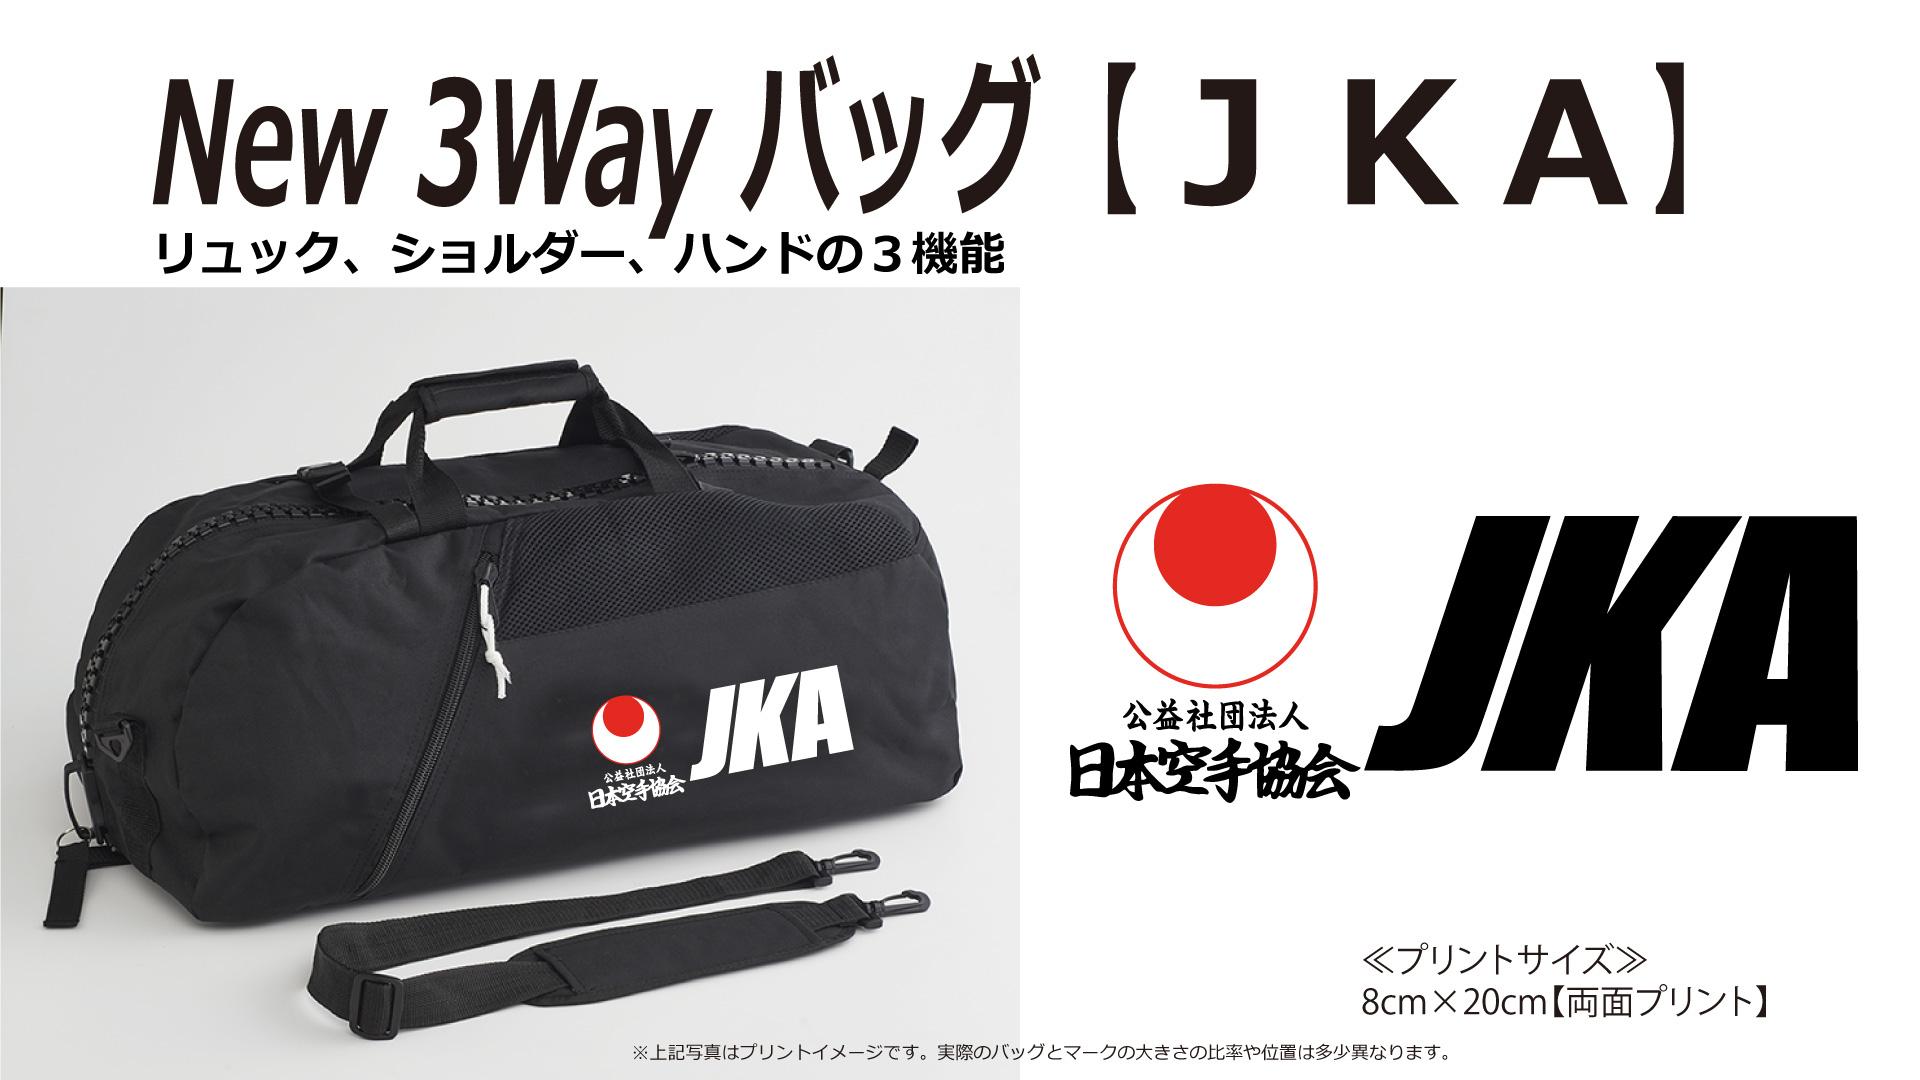 <NEWデザイン> 3WAYバッグ(JKA日本空手協会)